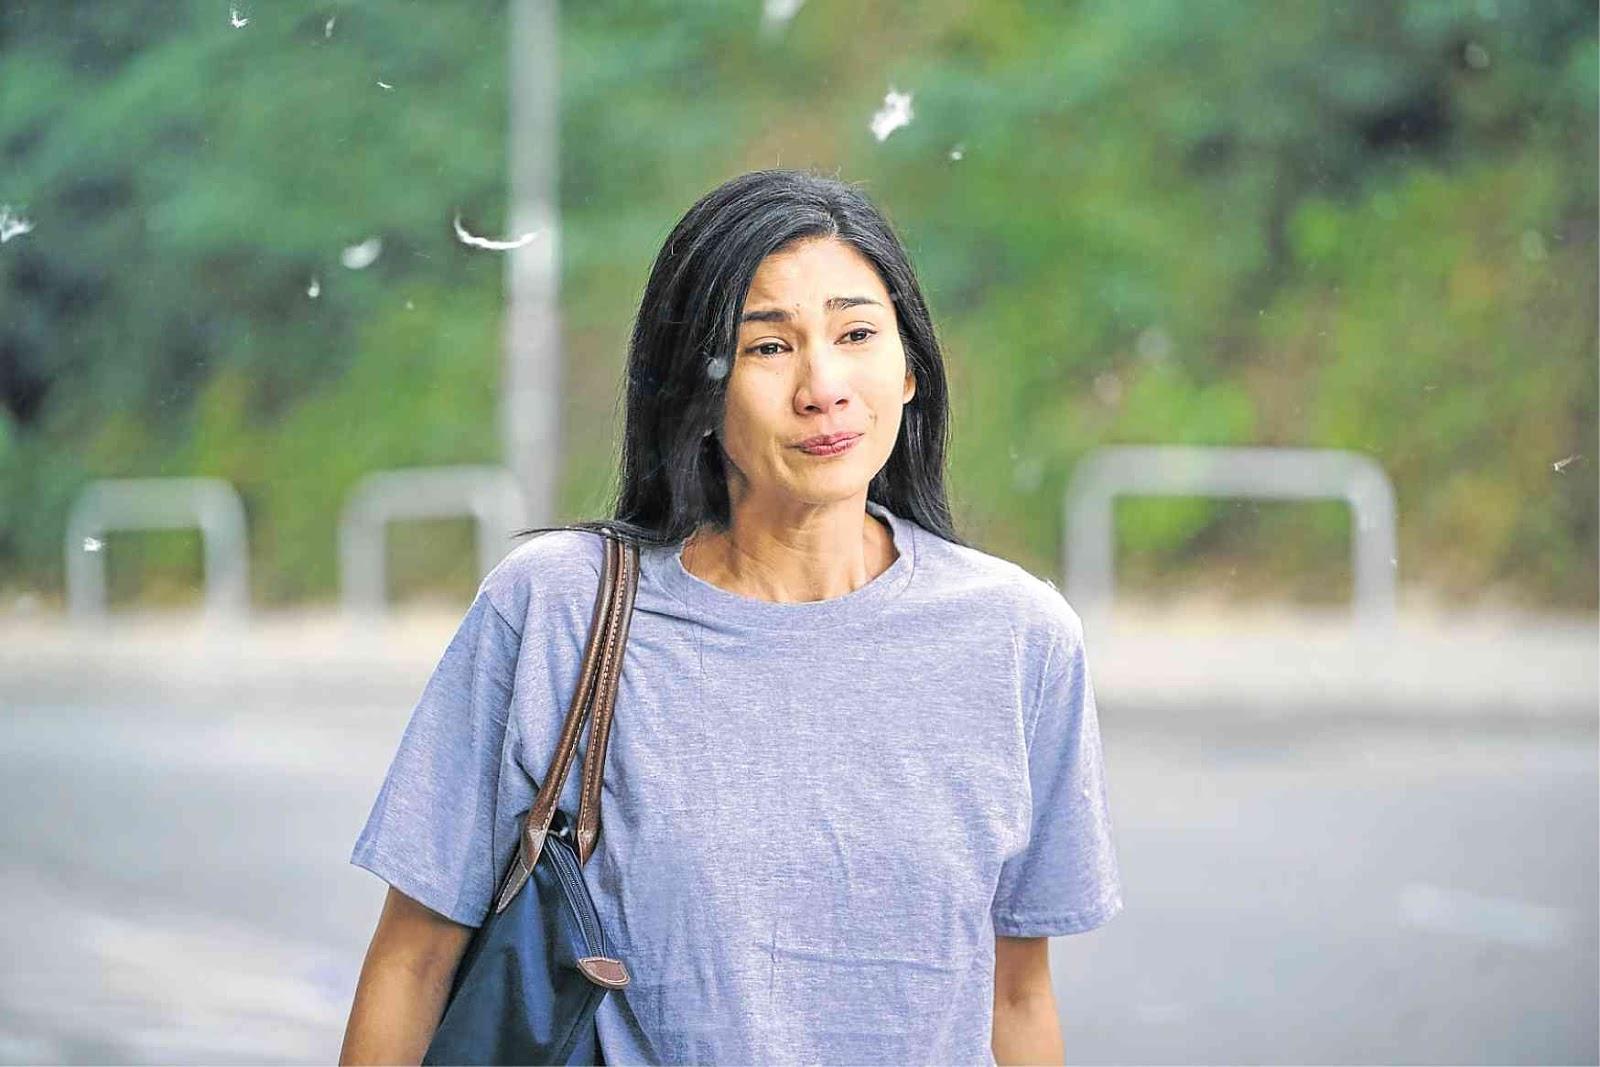 Pinay topbills new film in Hong Kong, receives 'Best Actress' nomination